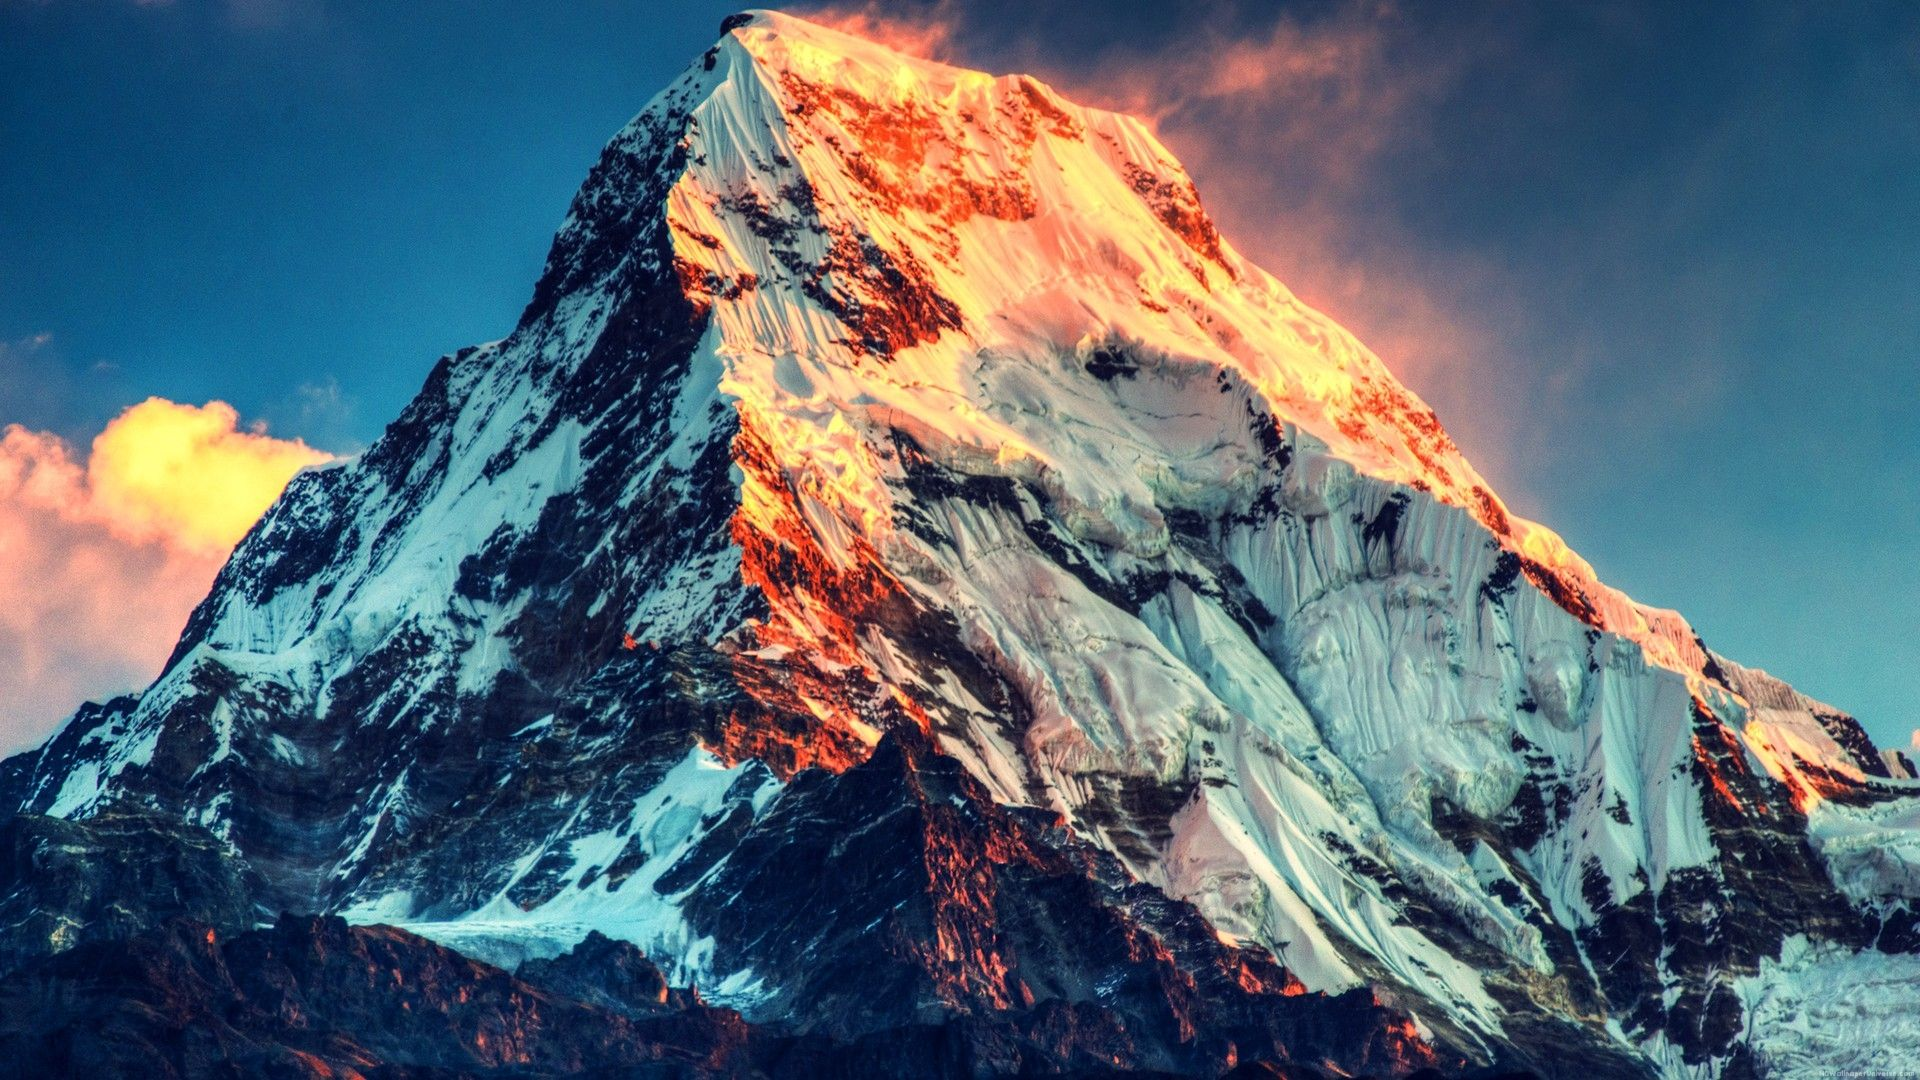 Pin By Croif On Hd Desktop Wallpapers Pinterest Mountain